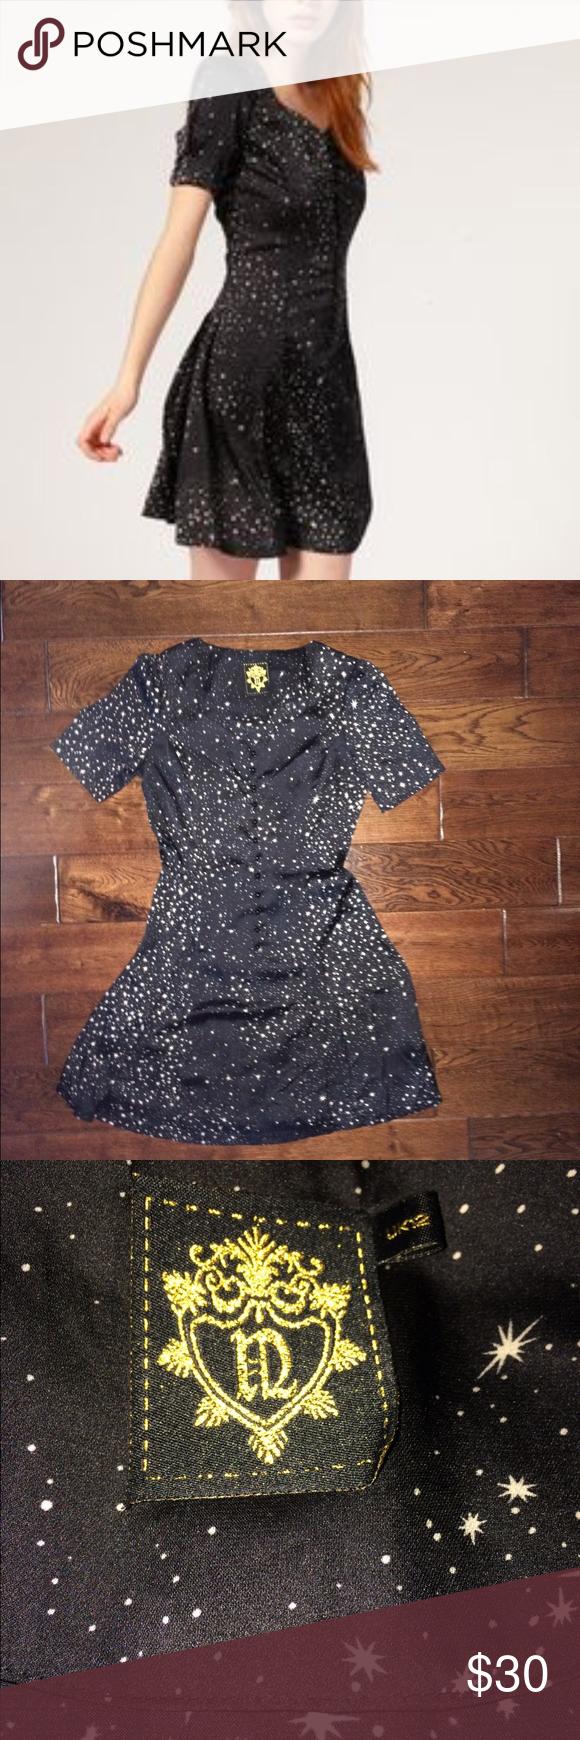 Niche Sweetheart Star Dress Super flattering! 100% Polyester dress. Worn twice. Excellent condition. niche Dresses